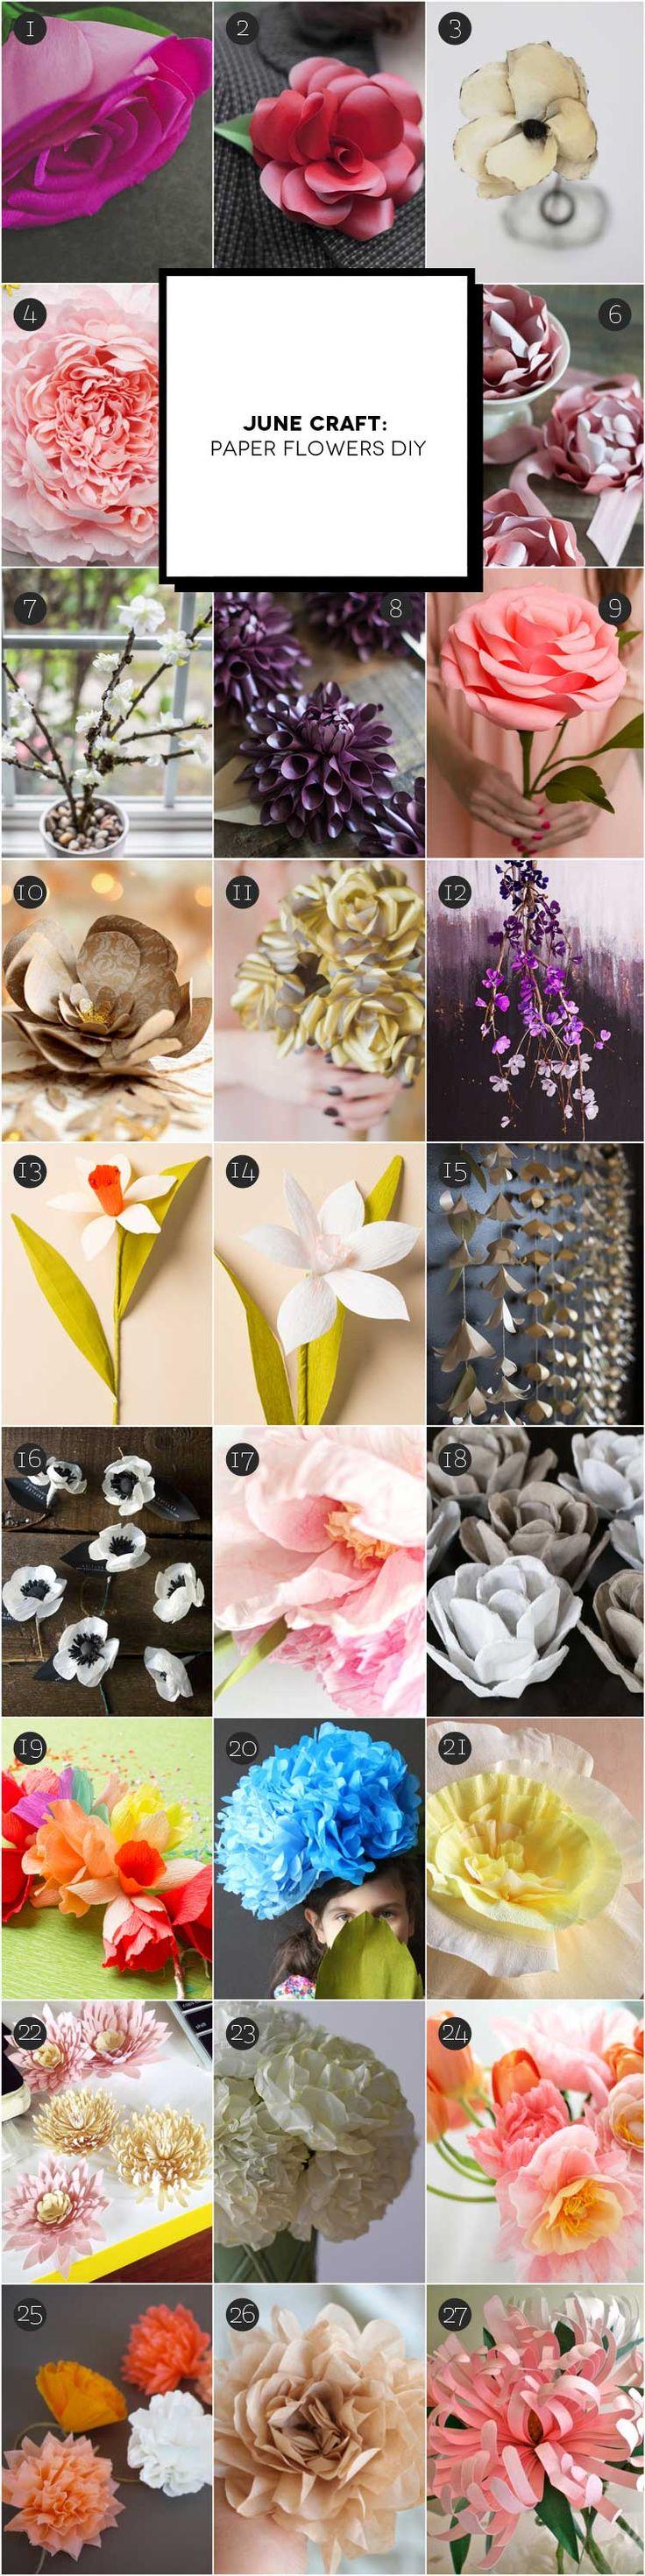 June Craft: realizzare fiori di carta | Inspire We Trust #diy #paperflowers #craft